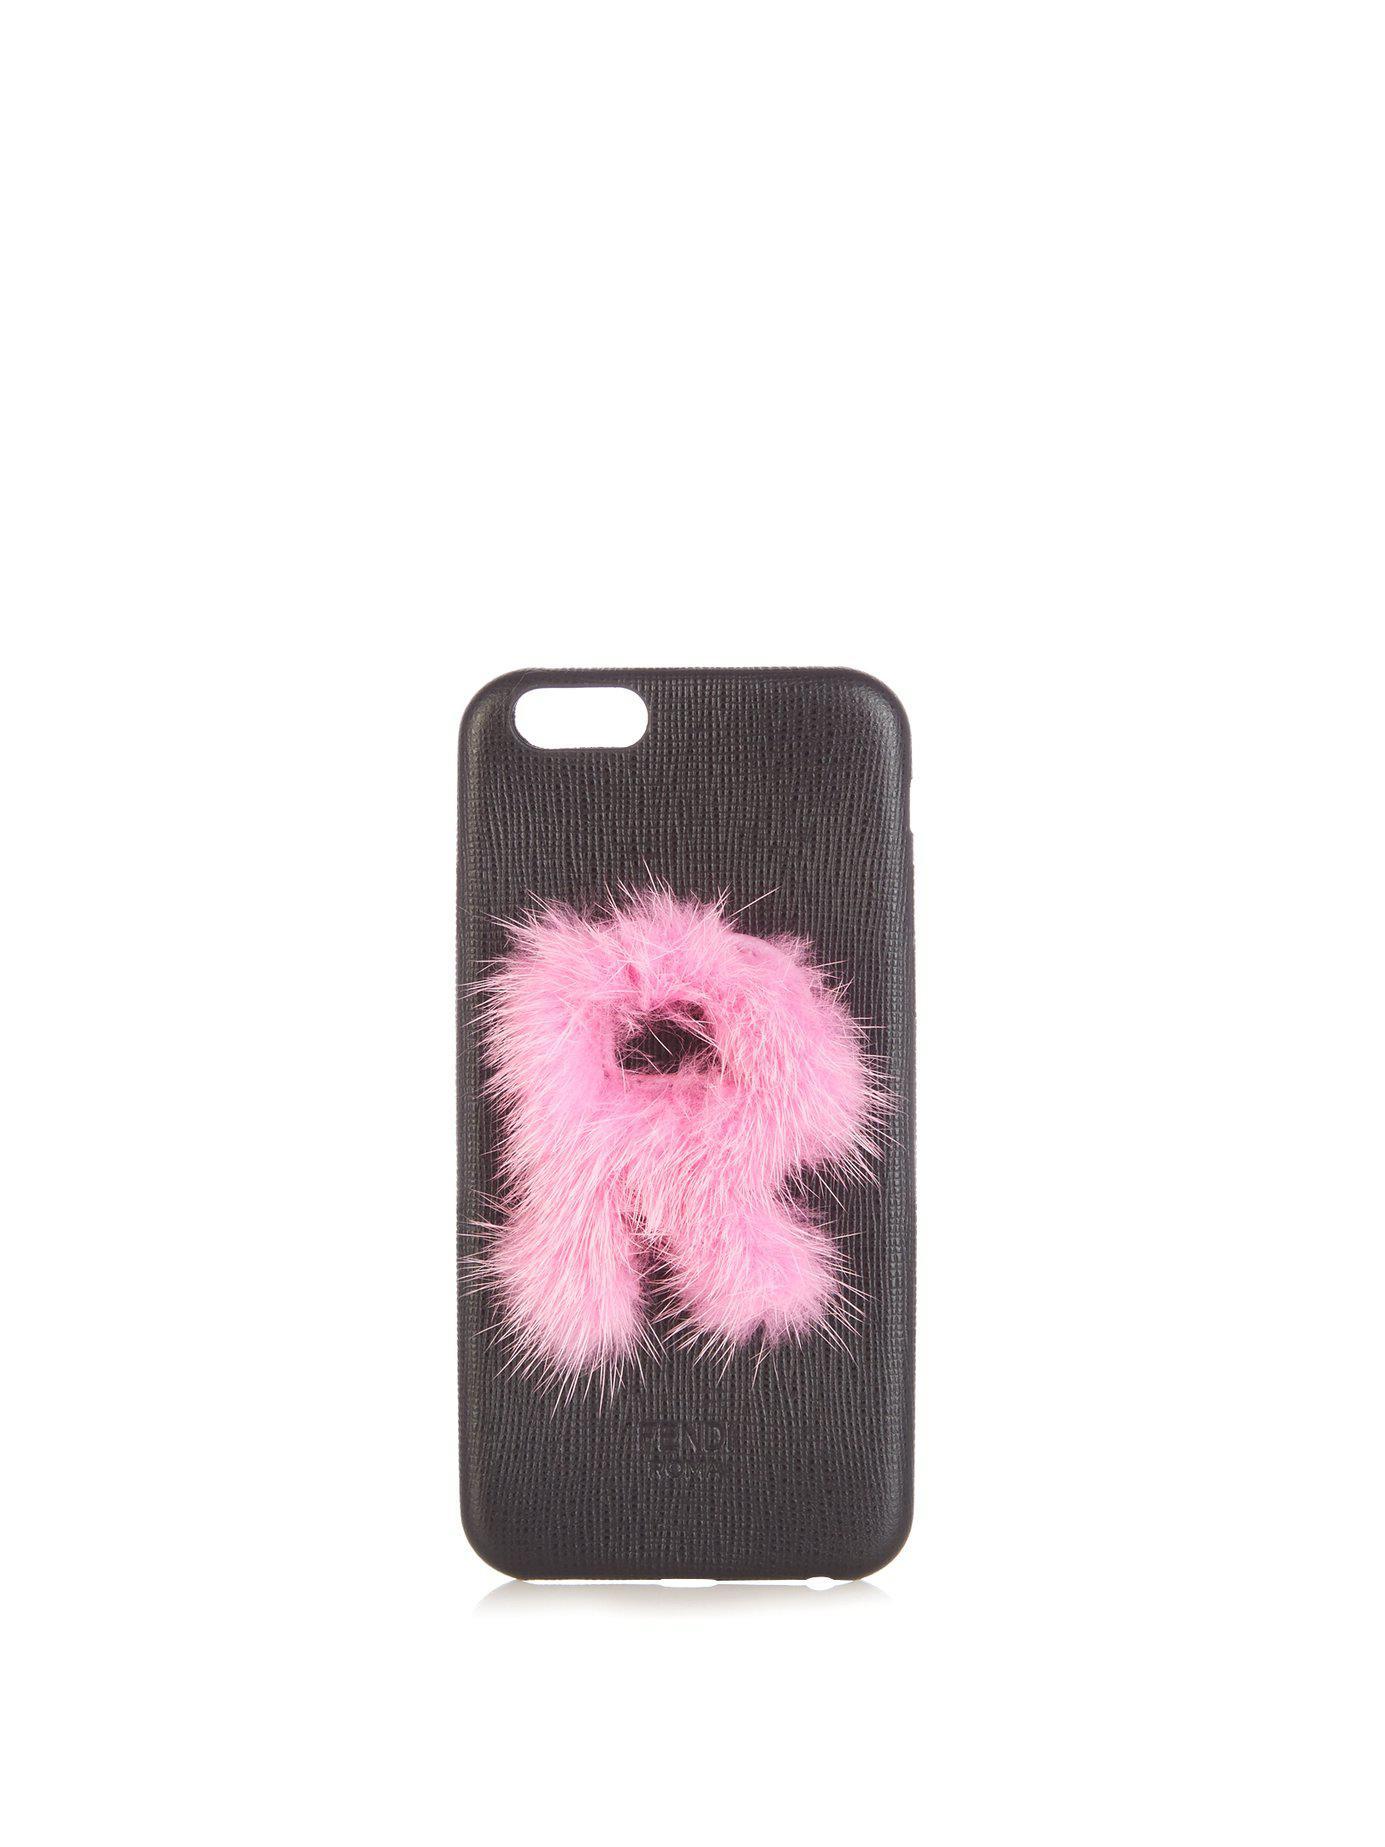 60cbbfb32e92 Lyst - Fendi Leather Iphone® 6 Case in Black